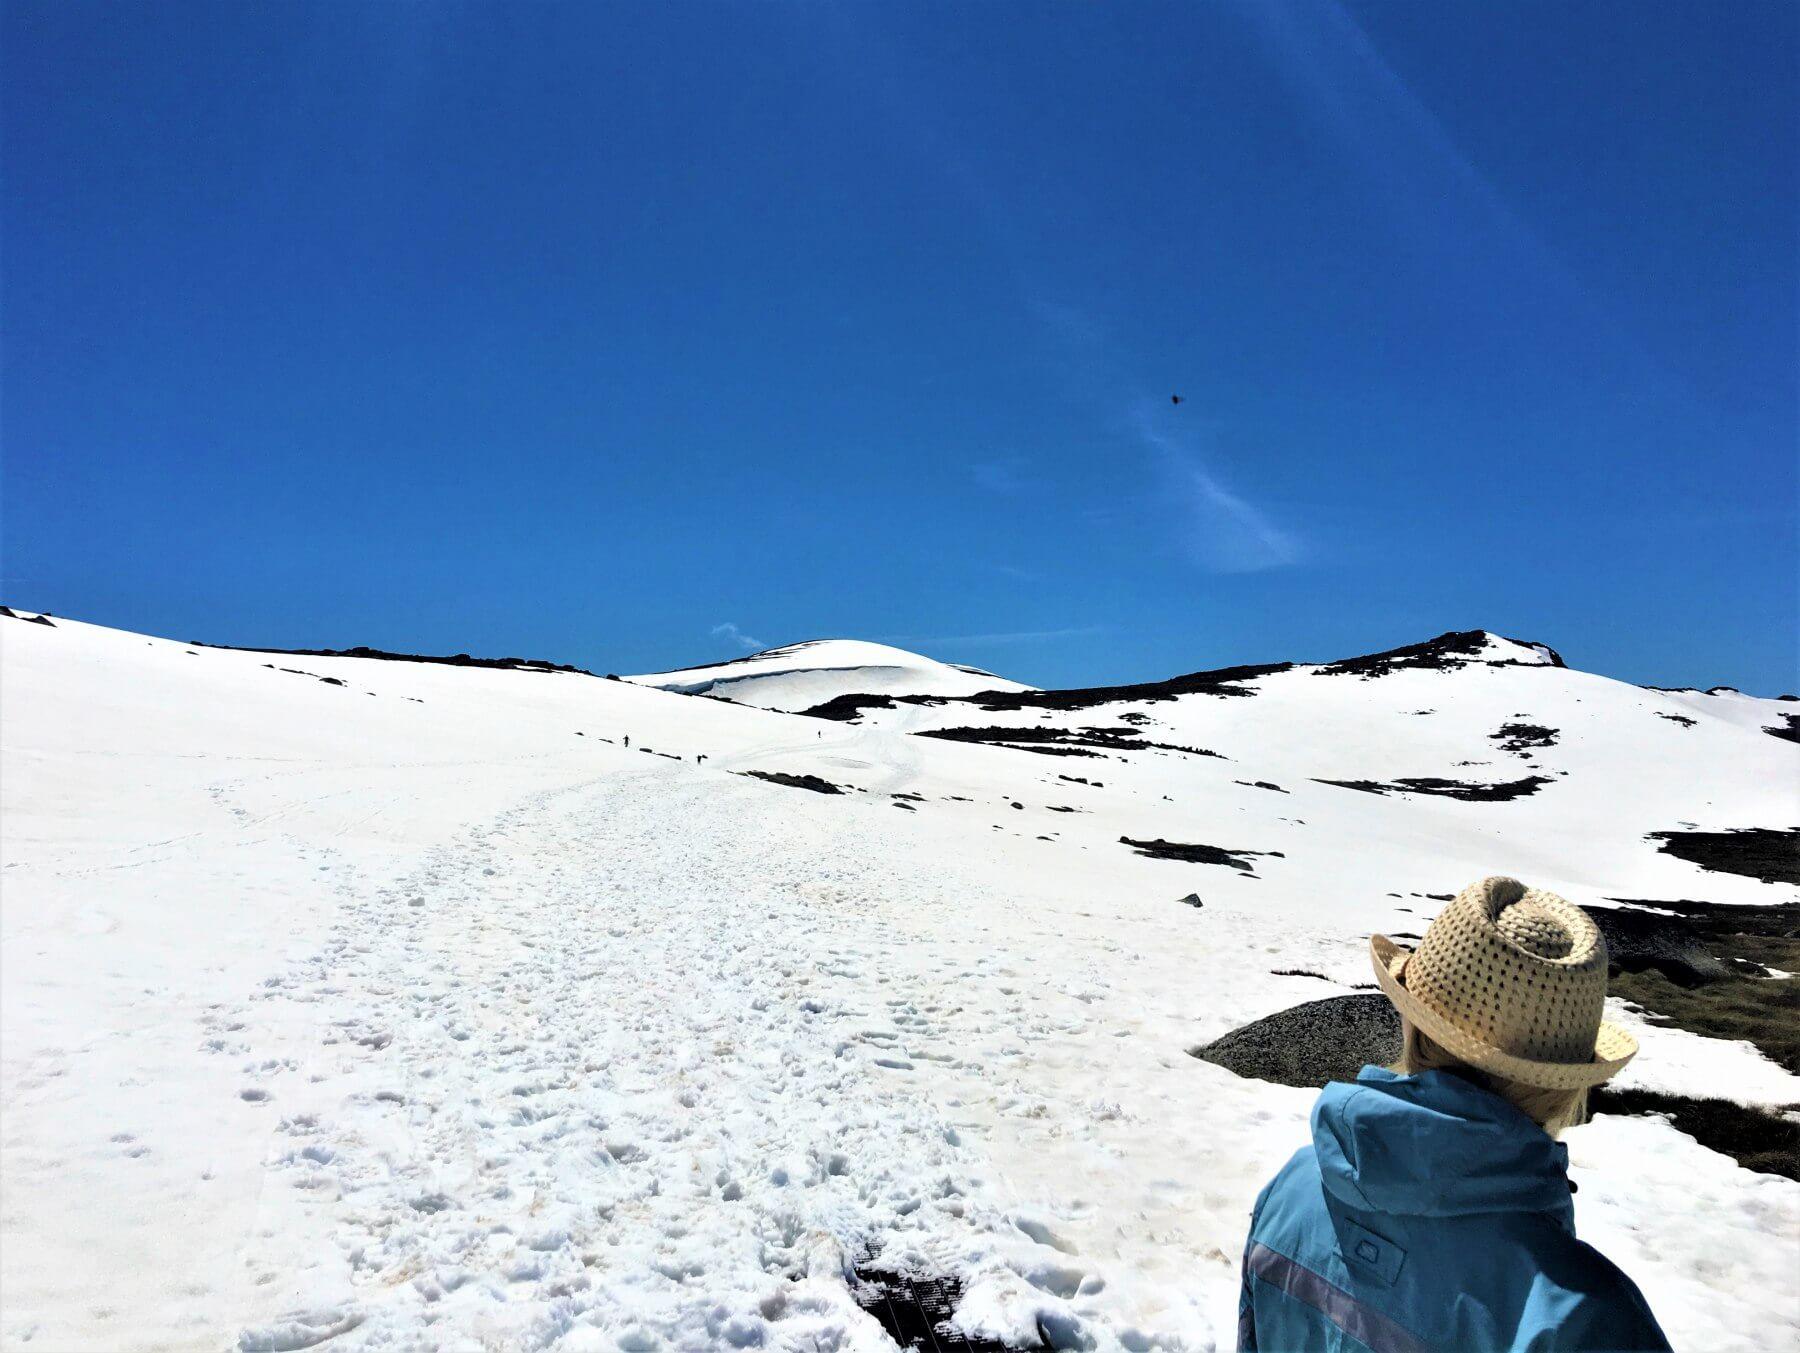 Mount Kosciuszko National Park